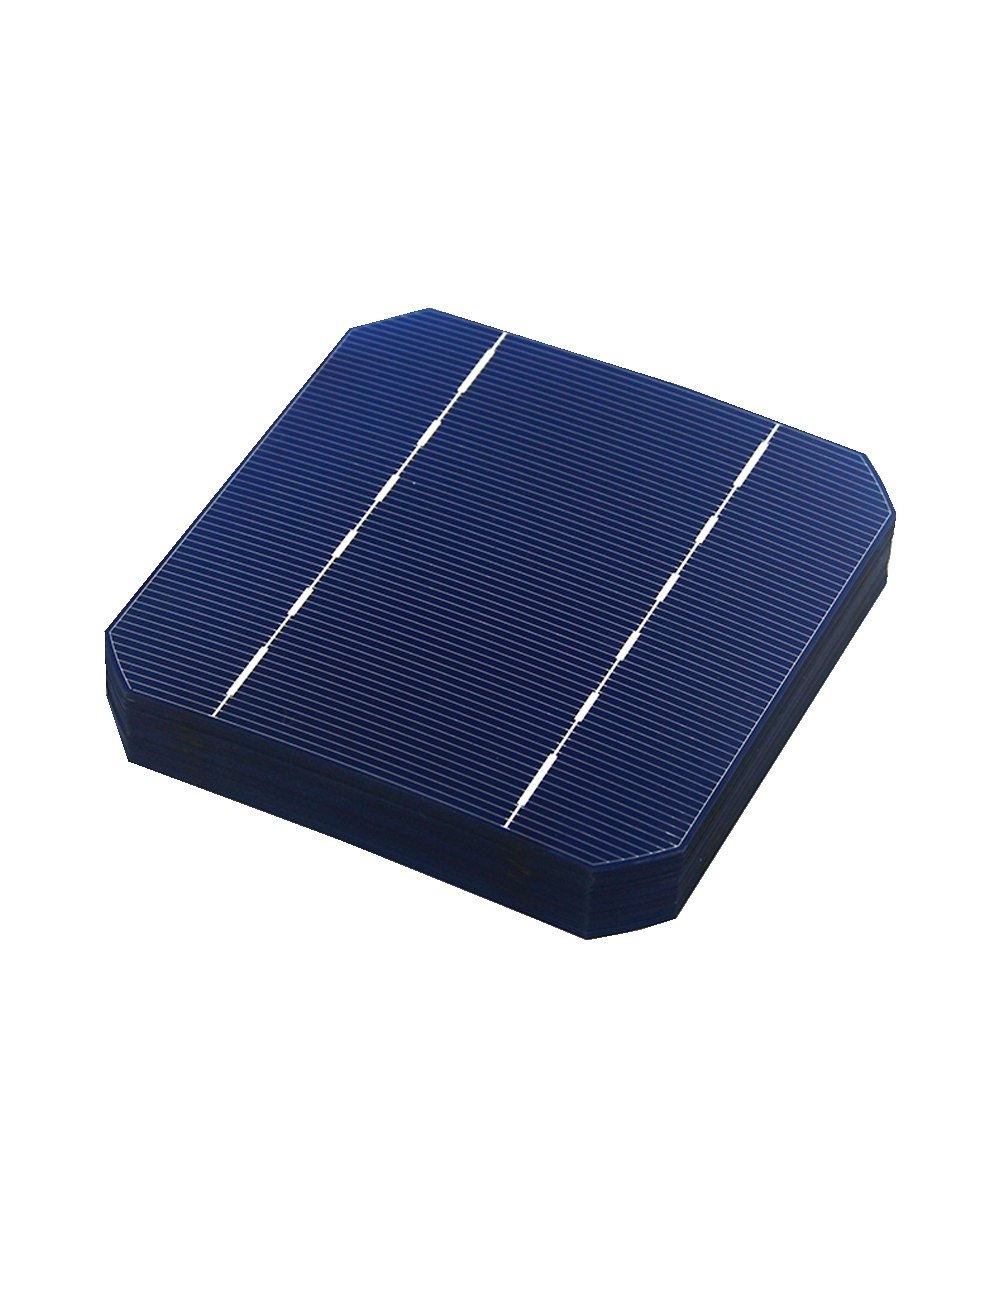 Vikocell 10 piezas 0.5V 2.7W 5x5 Monocristalino de cé lulas solares PV oblea para DIY Home Paneles solares fotovoltaicos